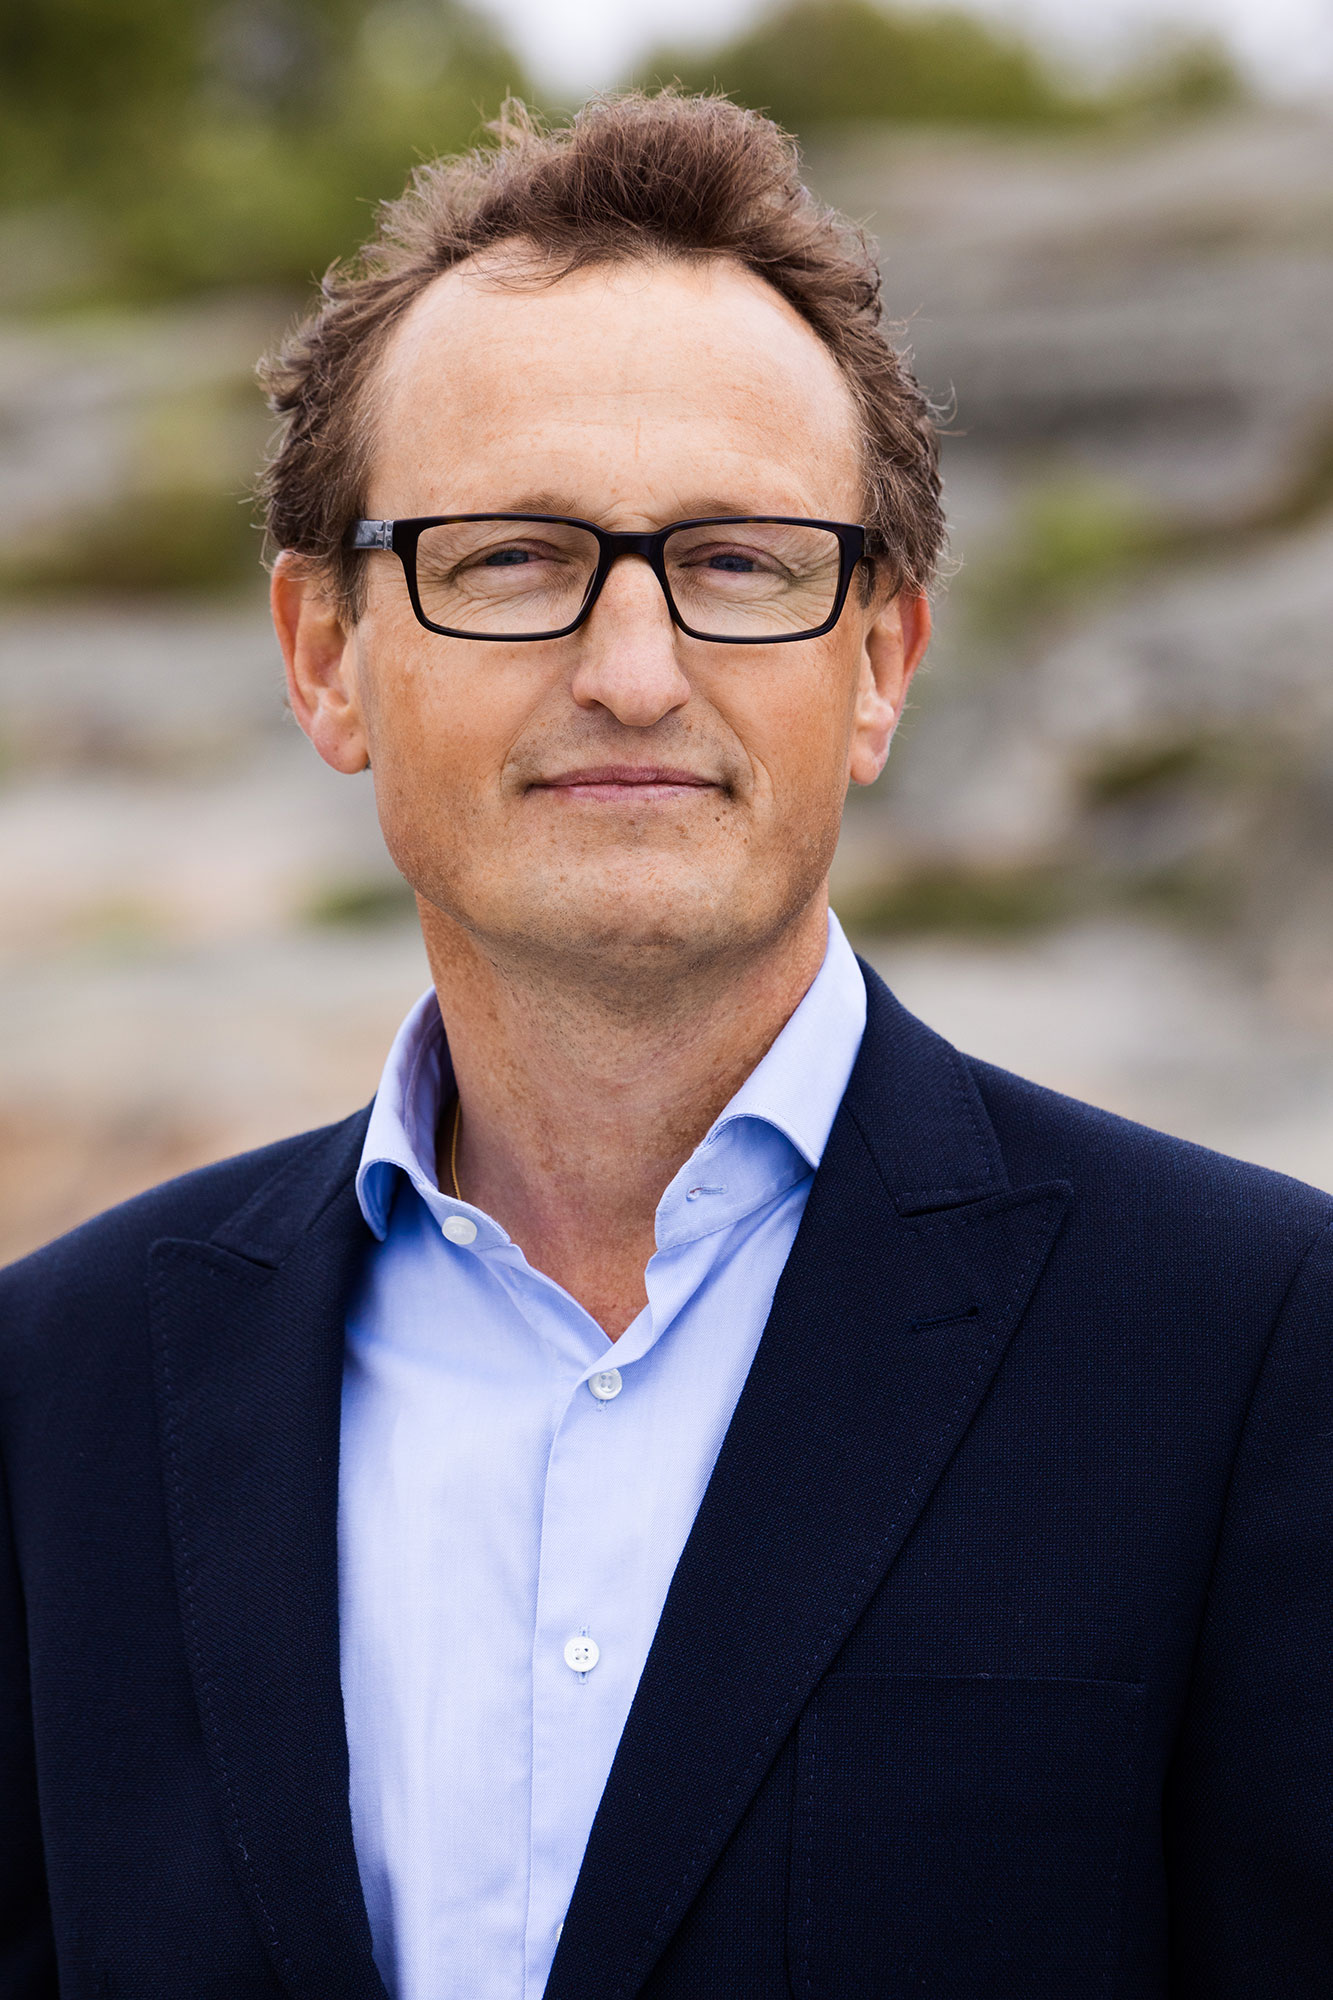 Jonas-gustavsson-jnj-survey-sweden